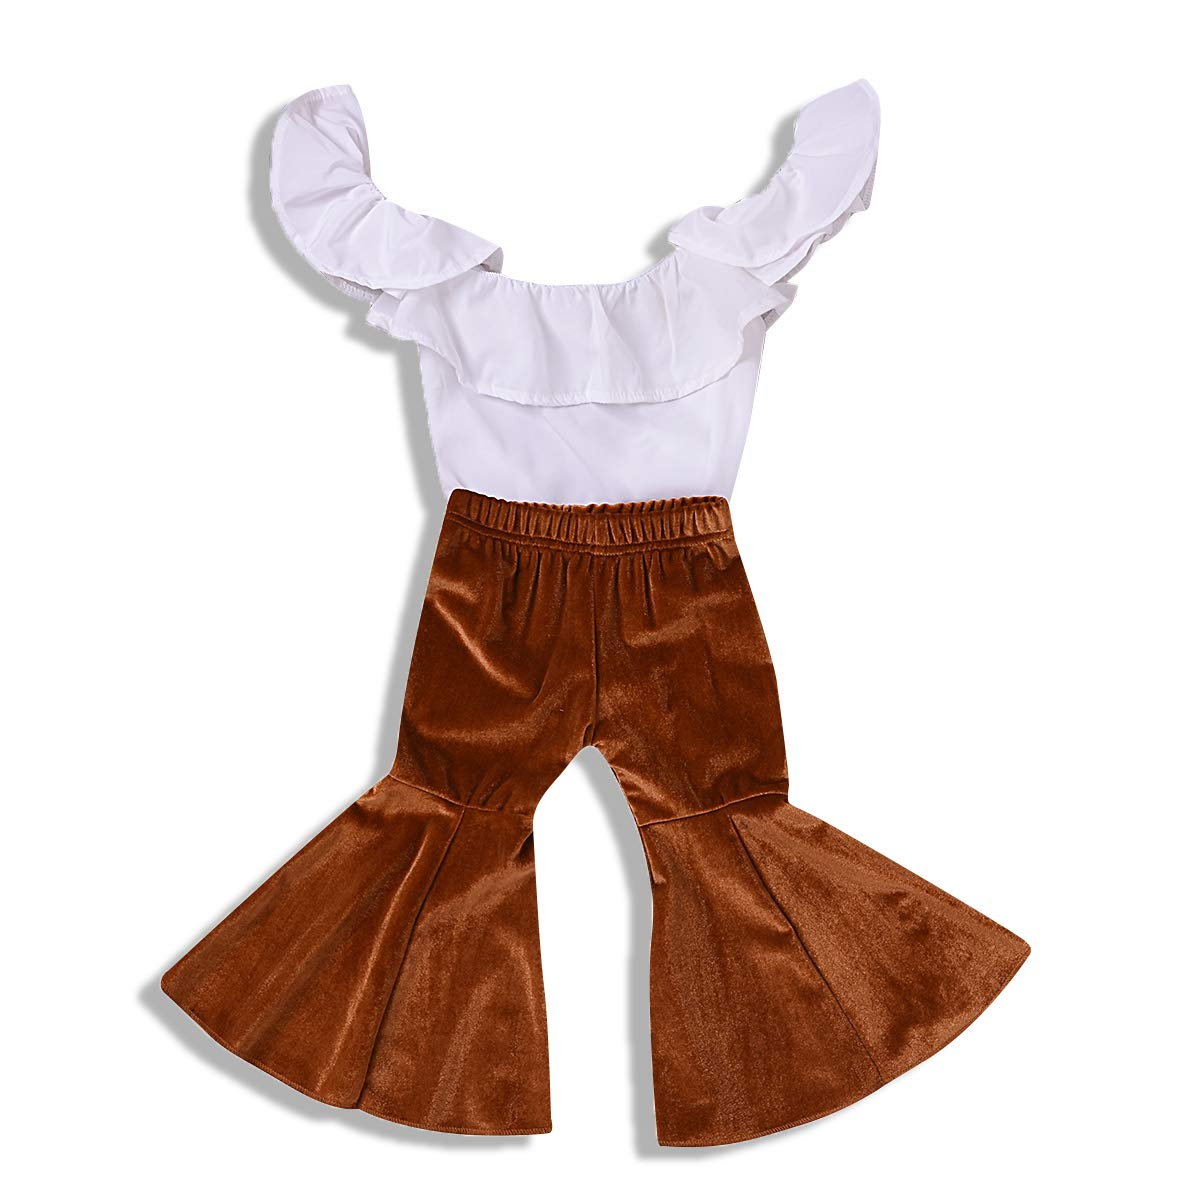 ZOELNIC Baby Girl Pants Set Toddler Girls Ruffle Off Shoulder Tops+Velvet Bell-Bottom Flared Pants Outfits